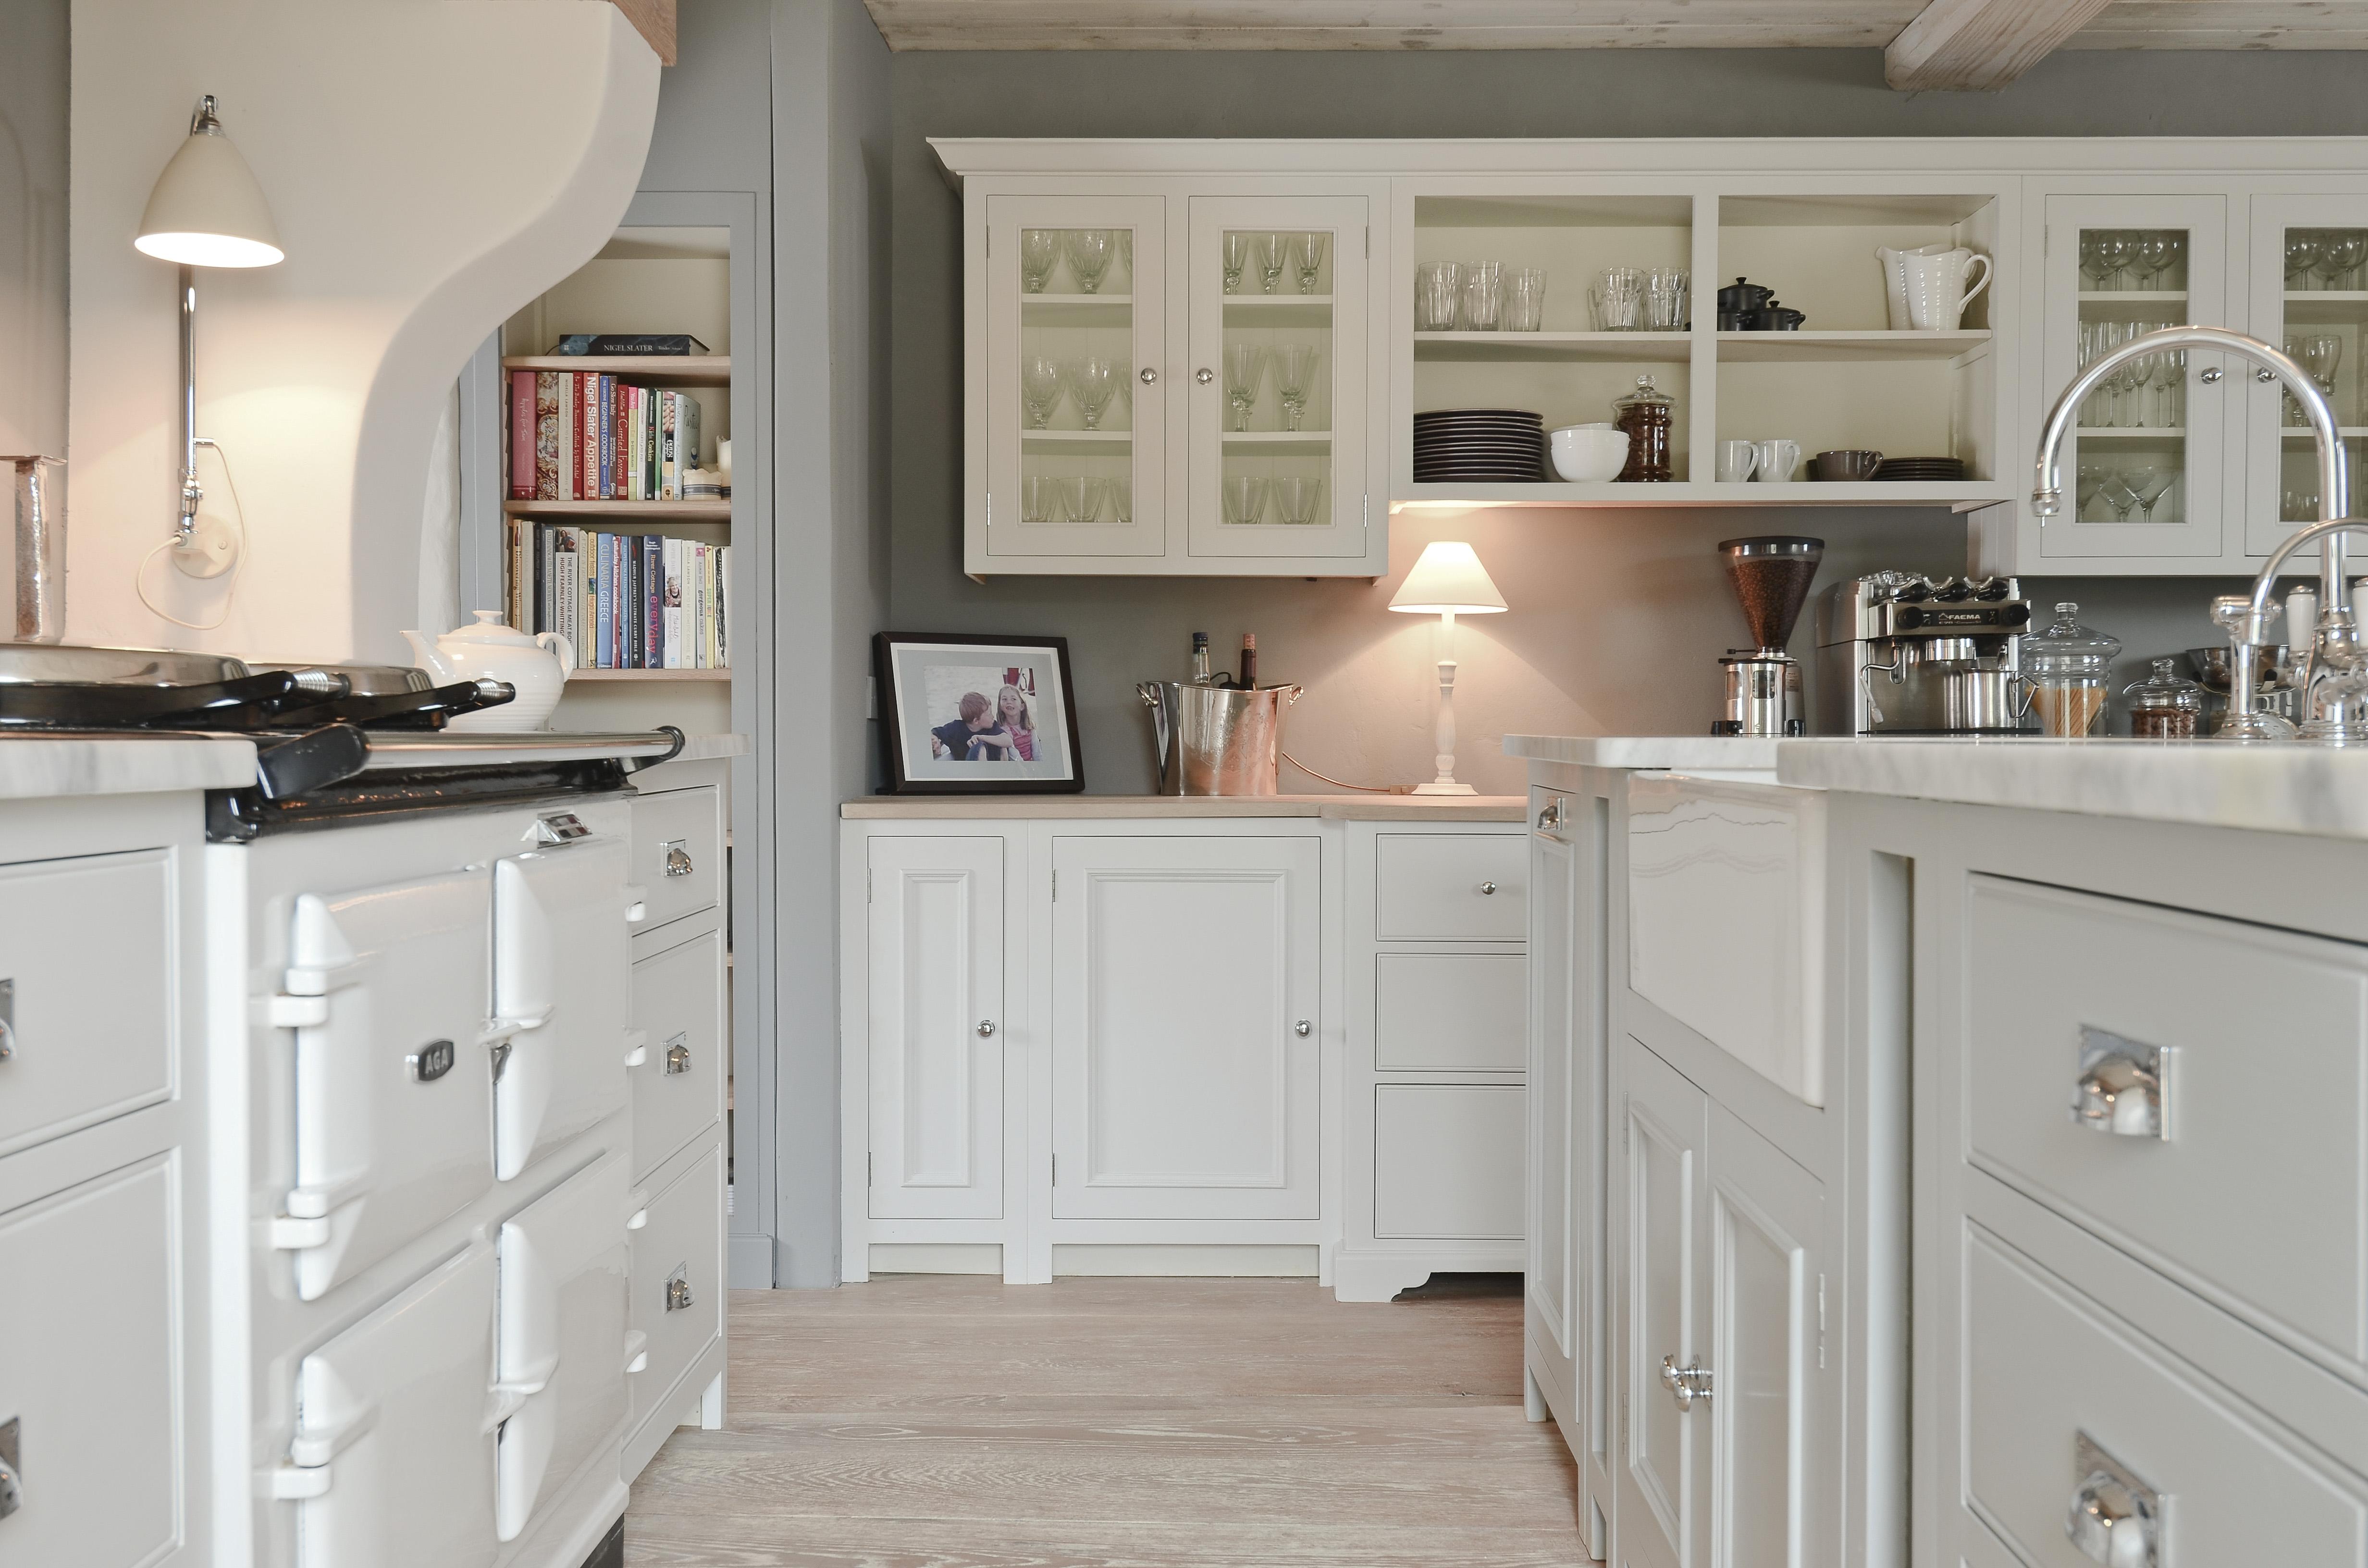 Neptune Kitchen Furniture Houseofwood Neptune Chichester Kitchen